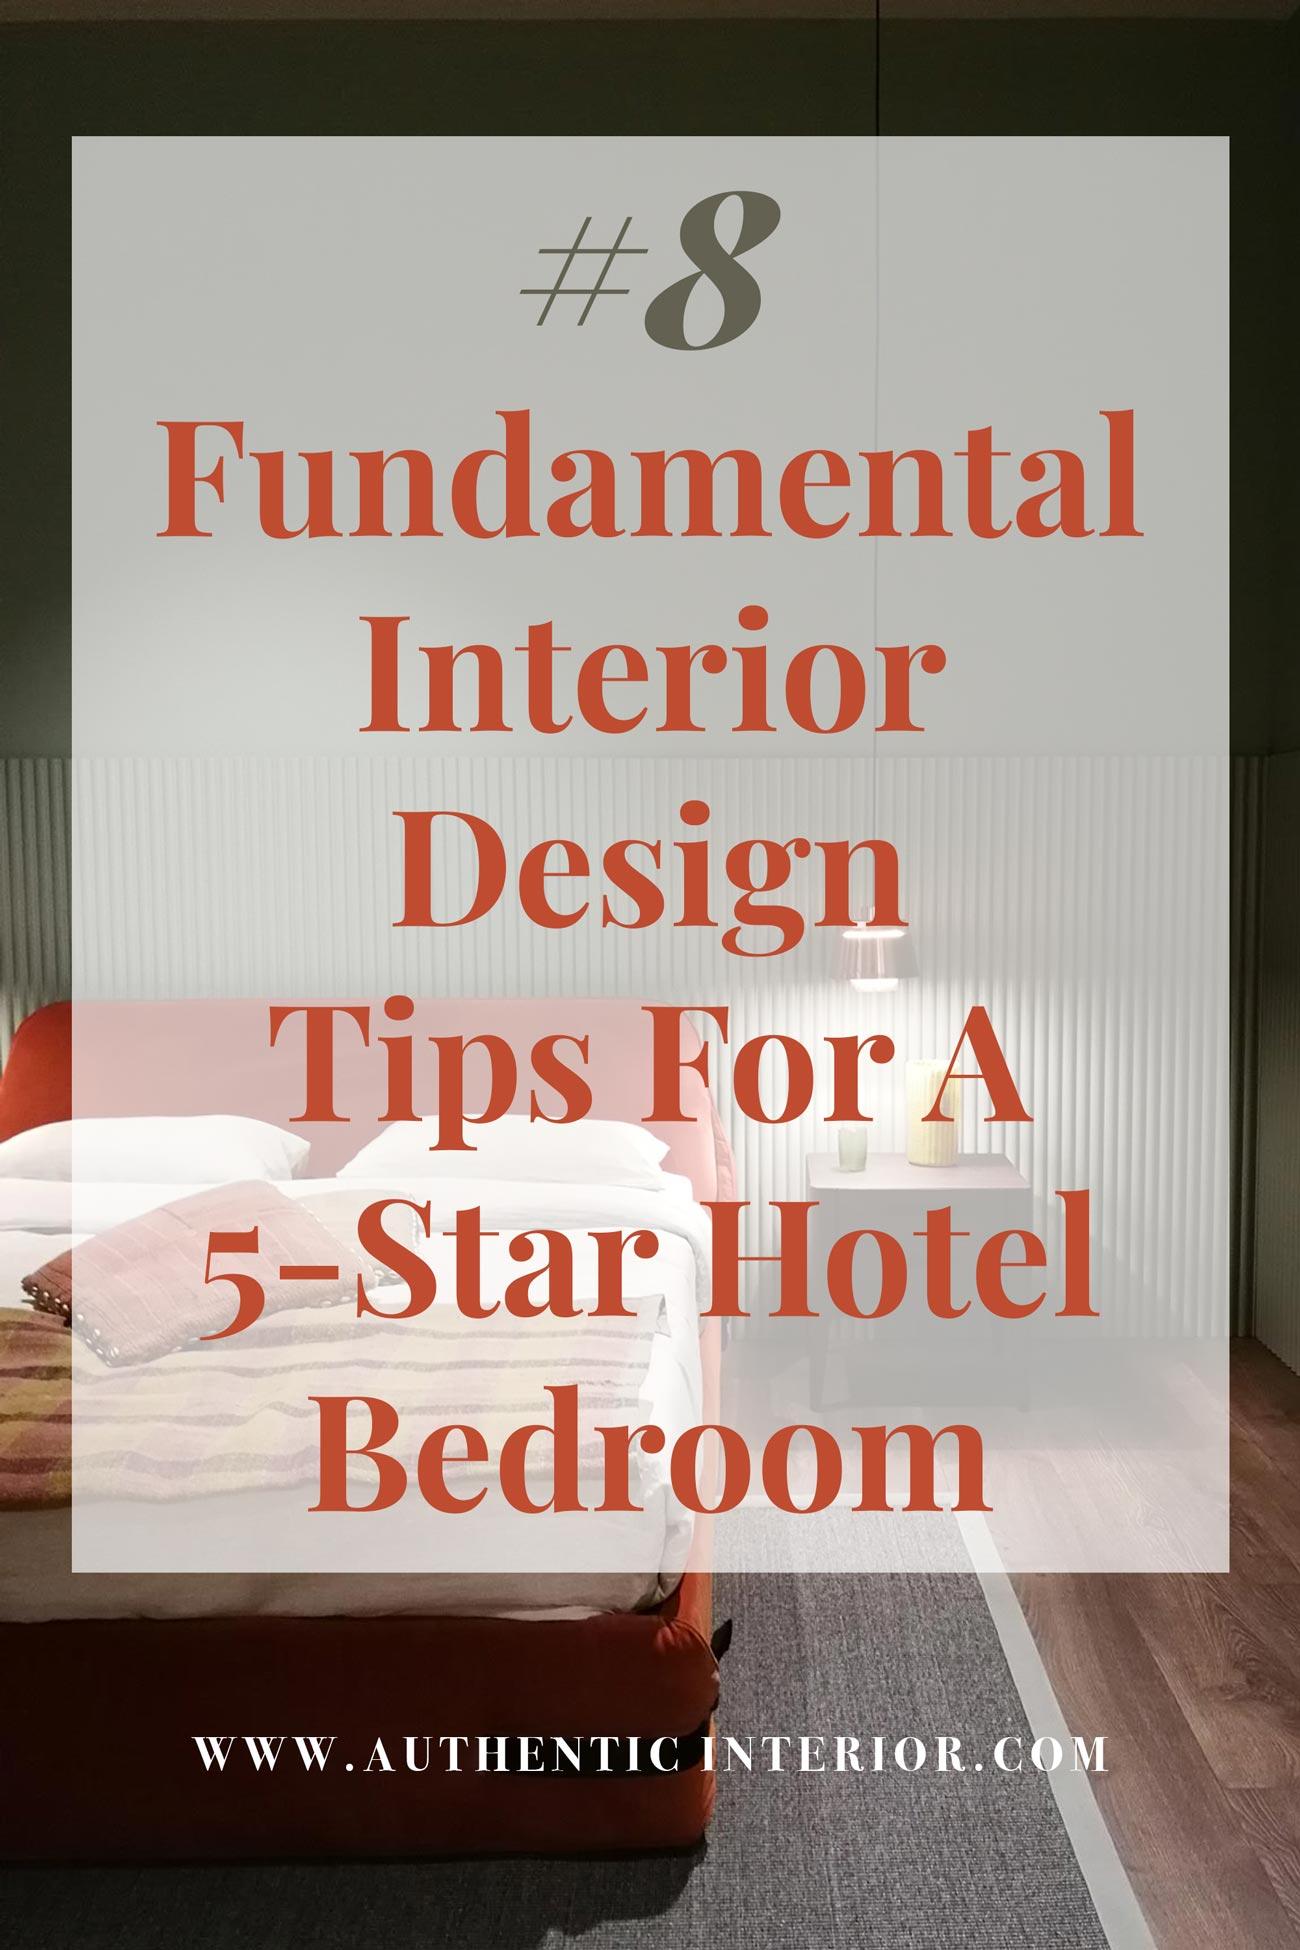 Interior-Design-Tips_5-Star-Hotel-Bedroom_authentic-interior-pin2